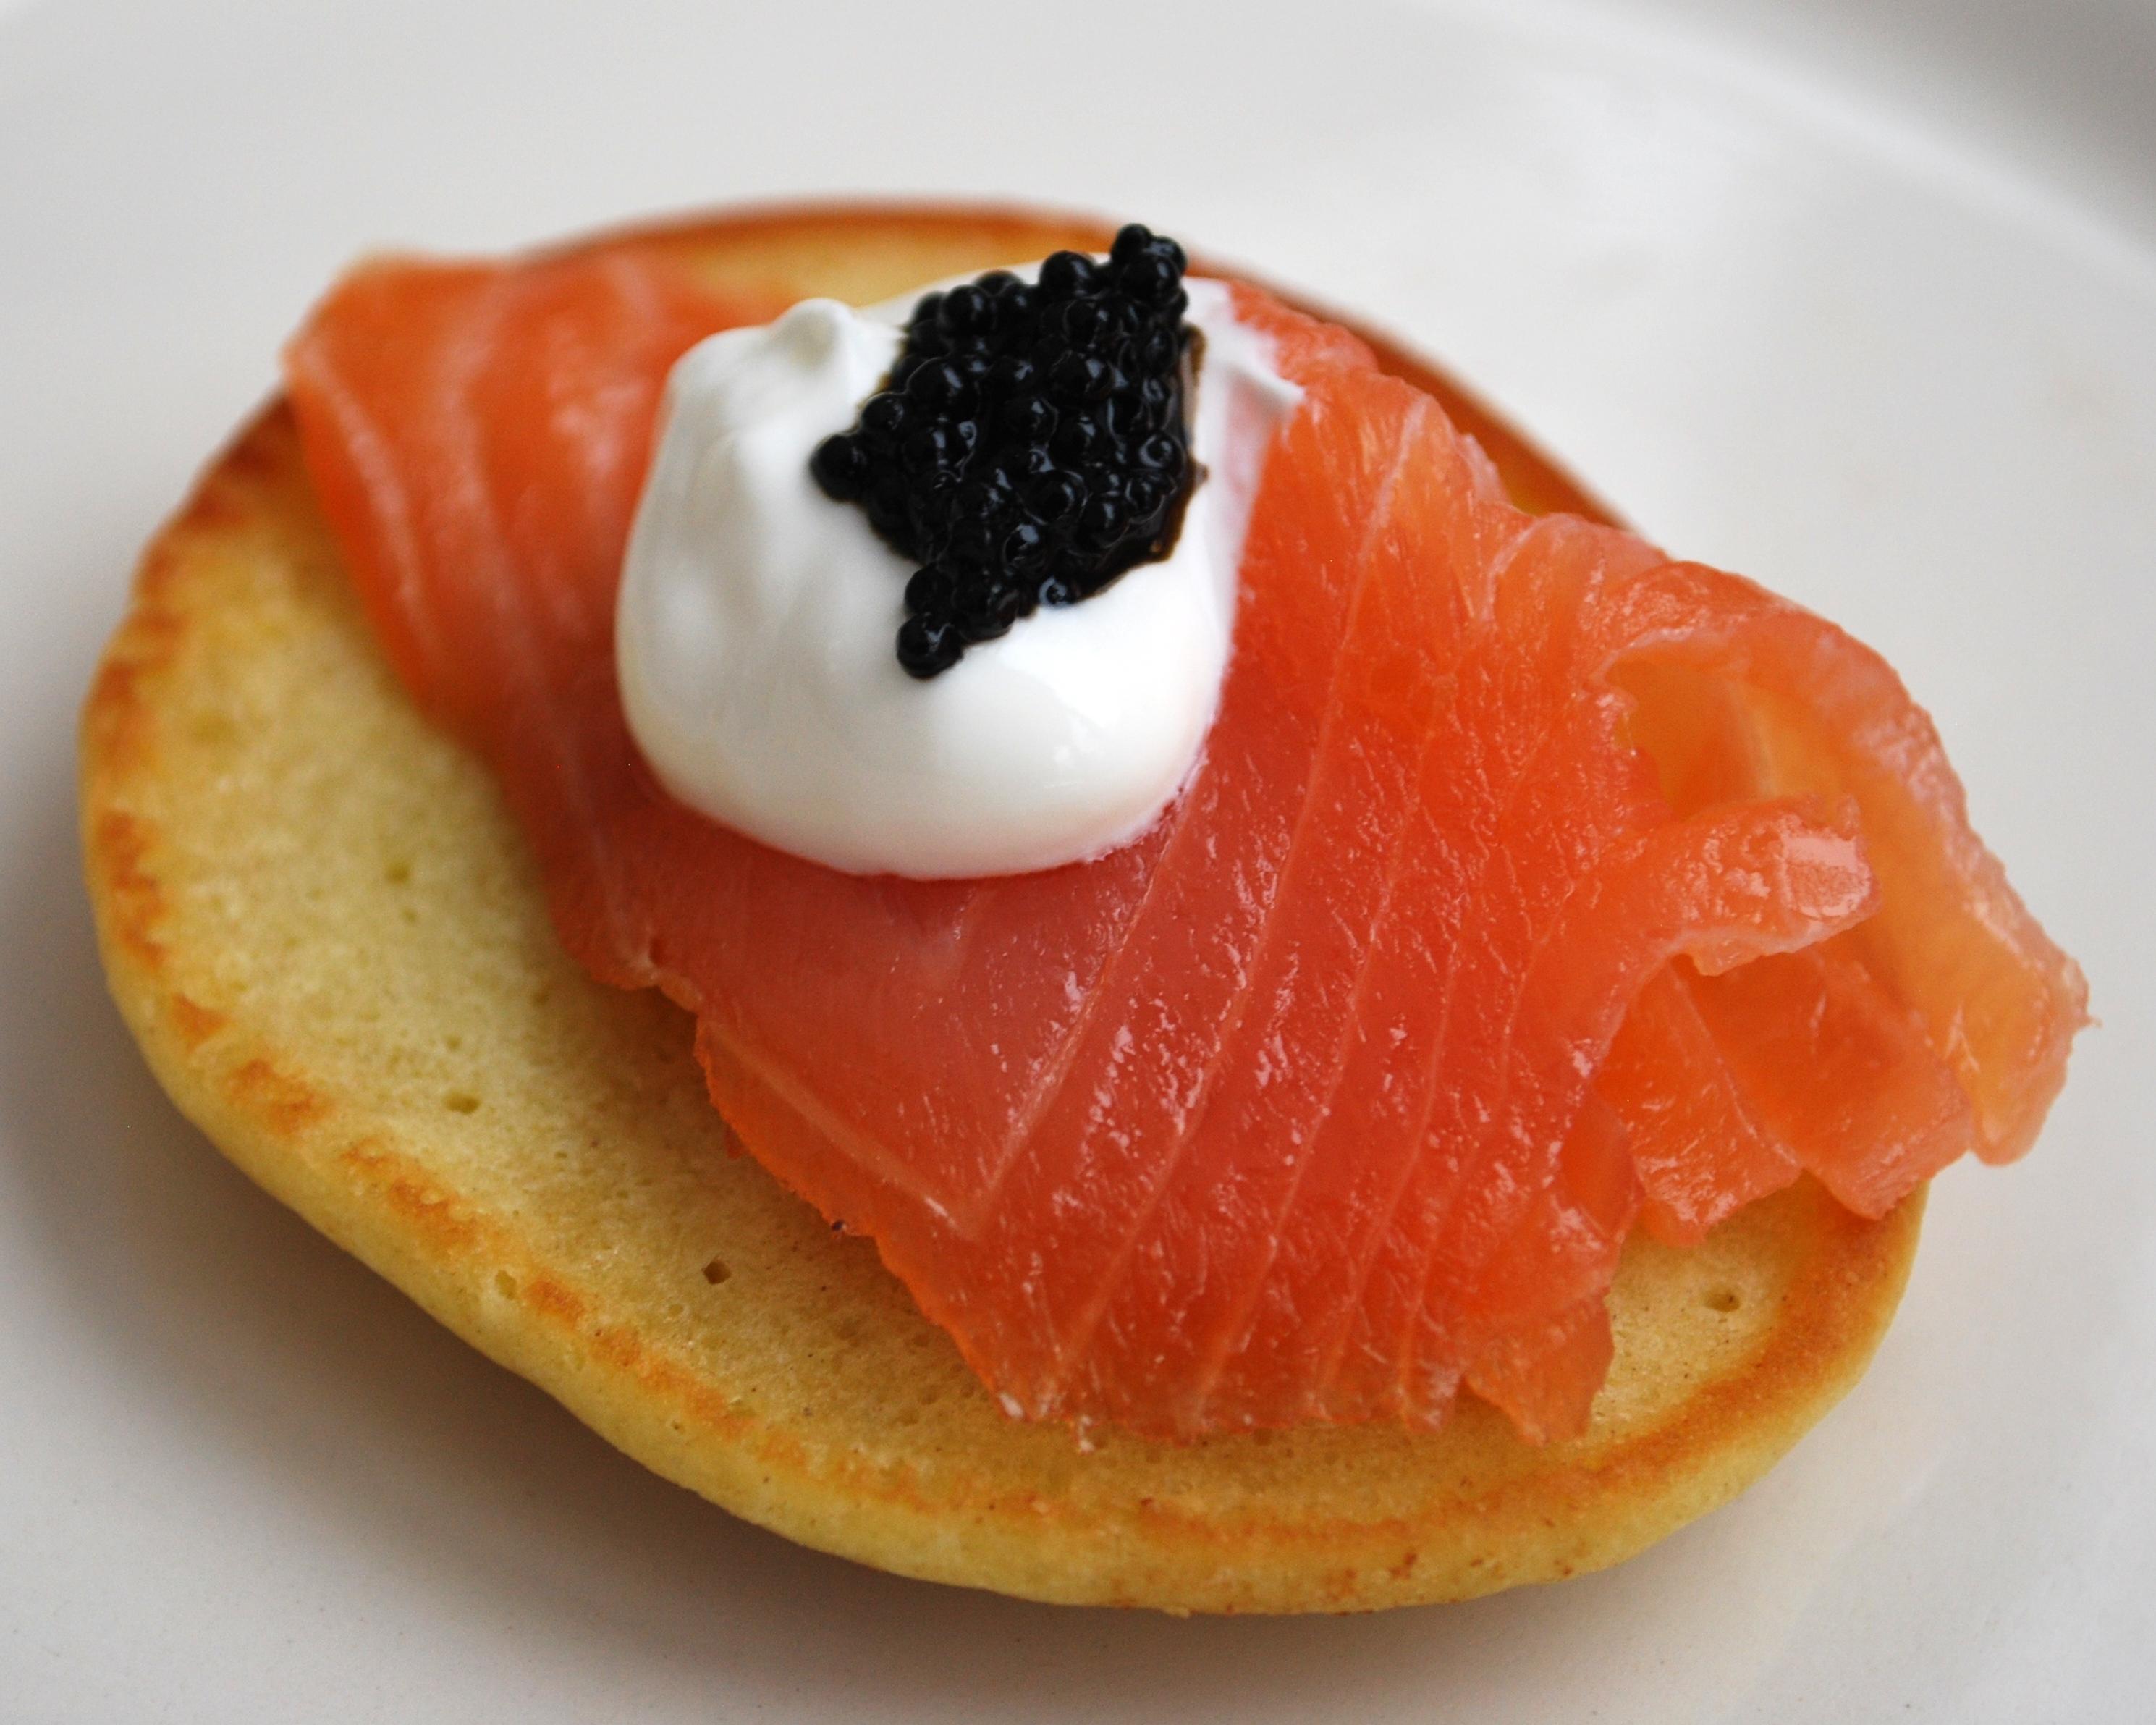 caviar salmon and caviar blini gravlax and salmon caviar red salmon ...